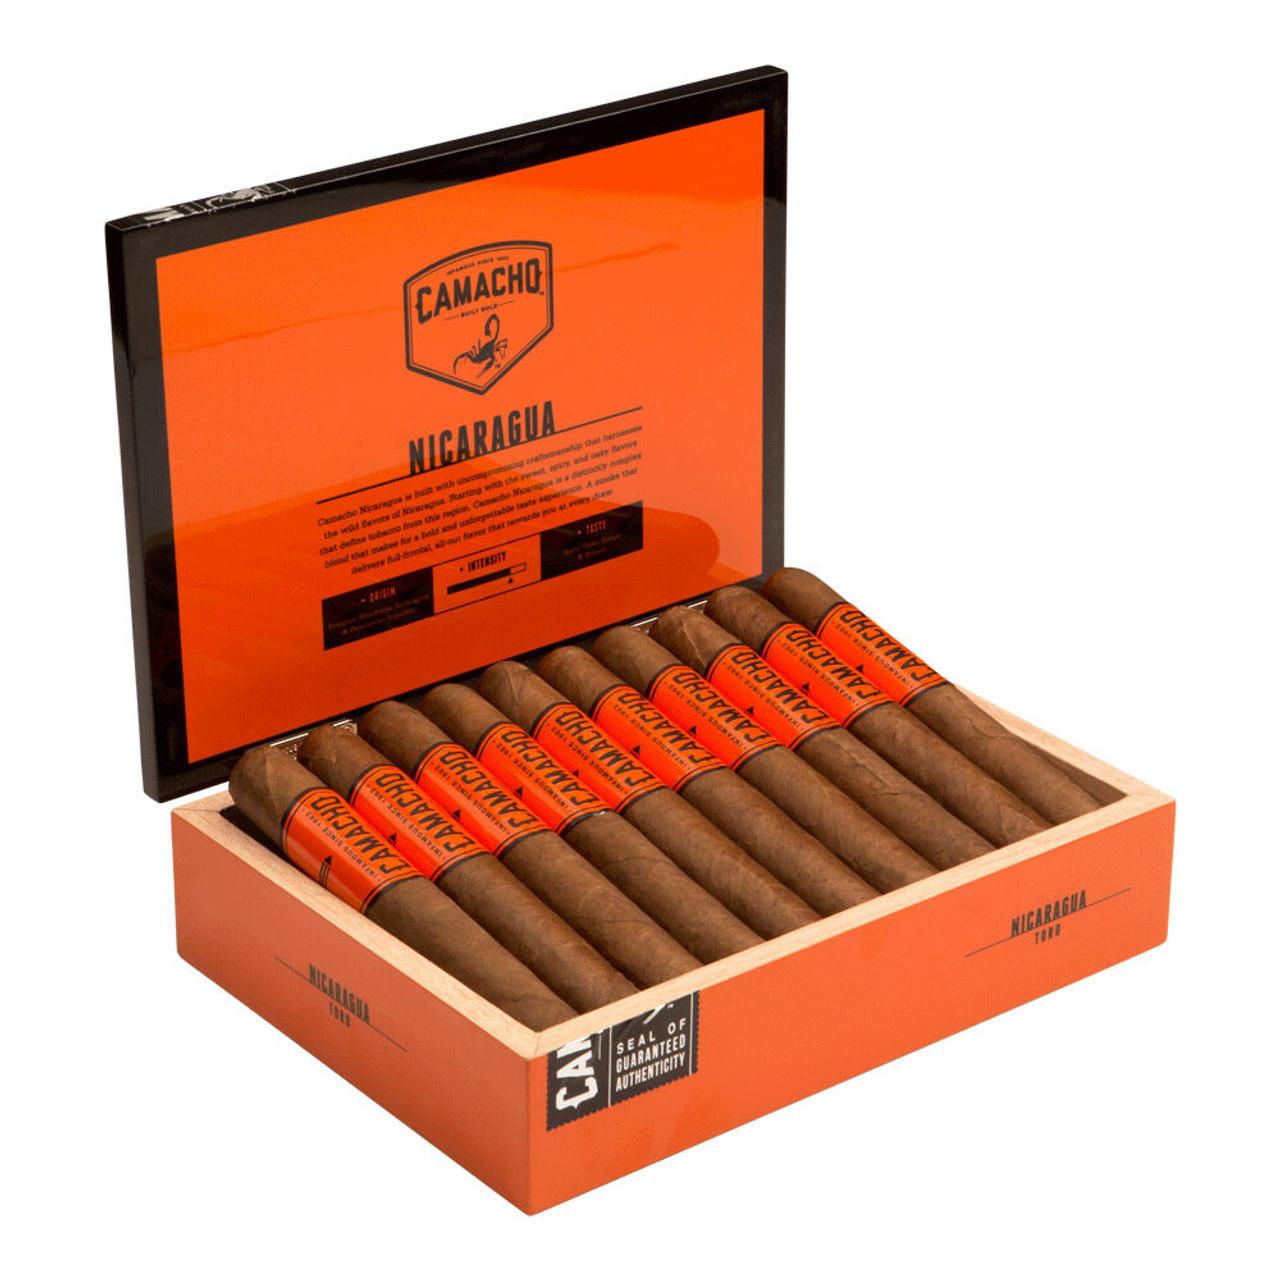 Camacho Nicaragua Toro Cigars - 6.0 x 60 (Box of 20)